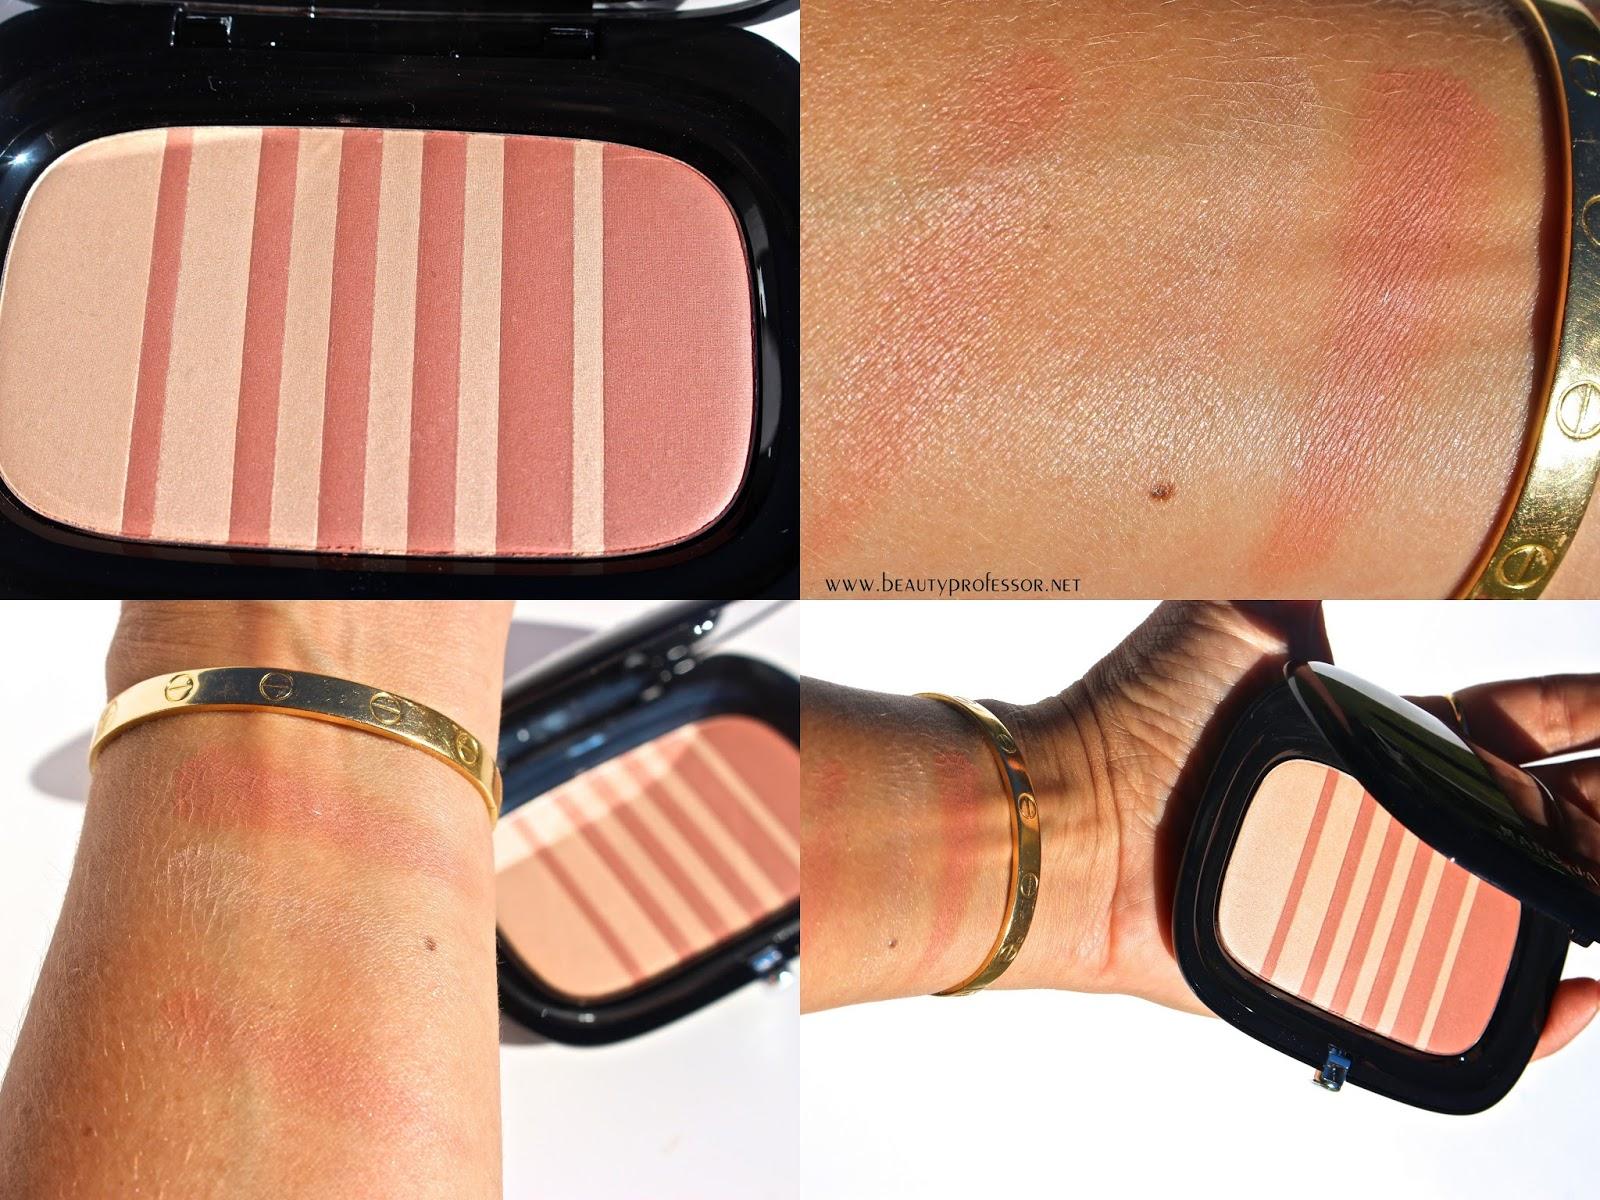 Gossamer Dreams: Introducing the Marc Jacobs Beauty Air Blush Soft Glow Duo  | Beauty Professor | Bloglovin'